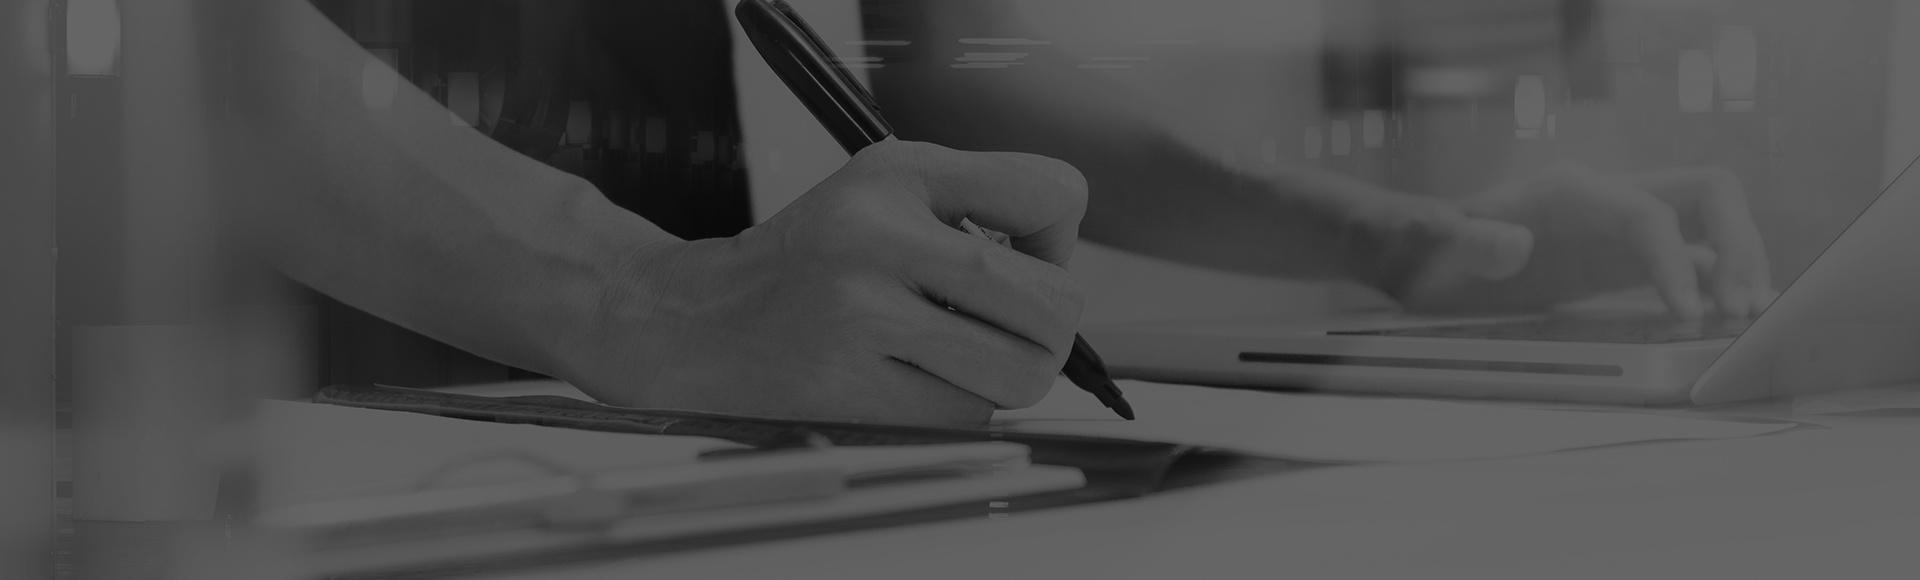 Website Content Management Systems by Nexa, Dubai